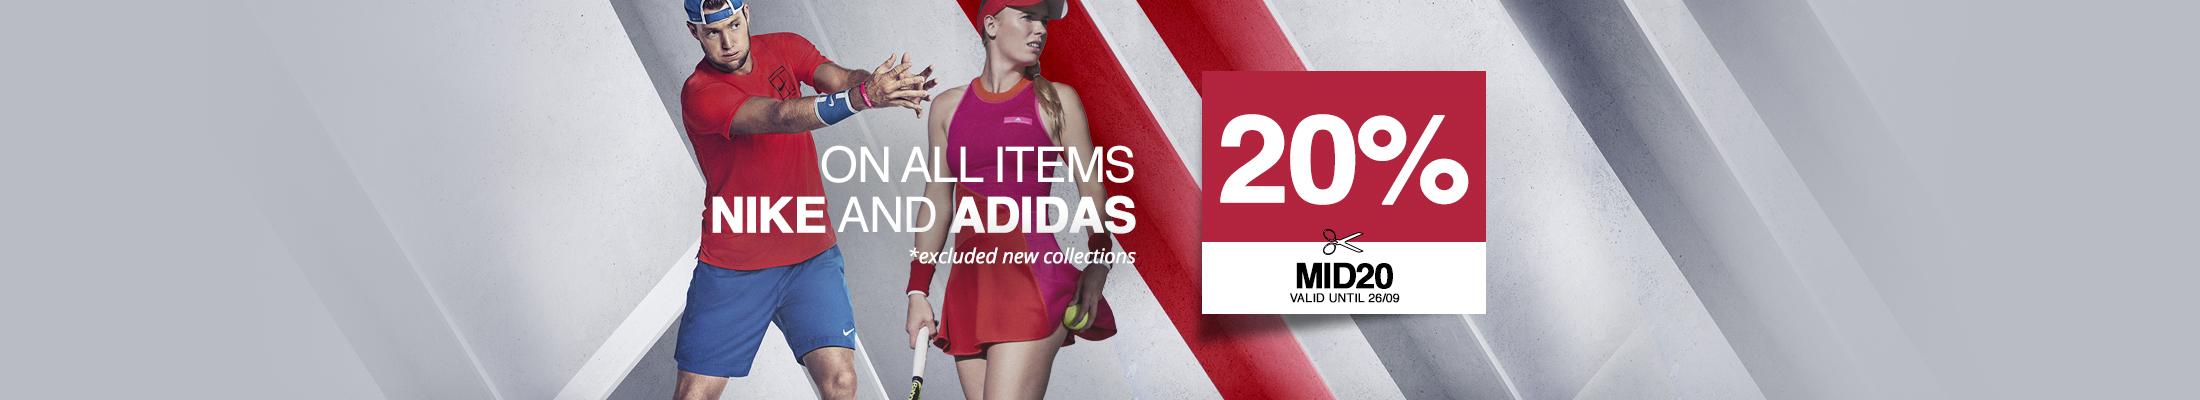 promo Nike Adidas